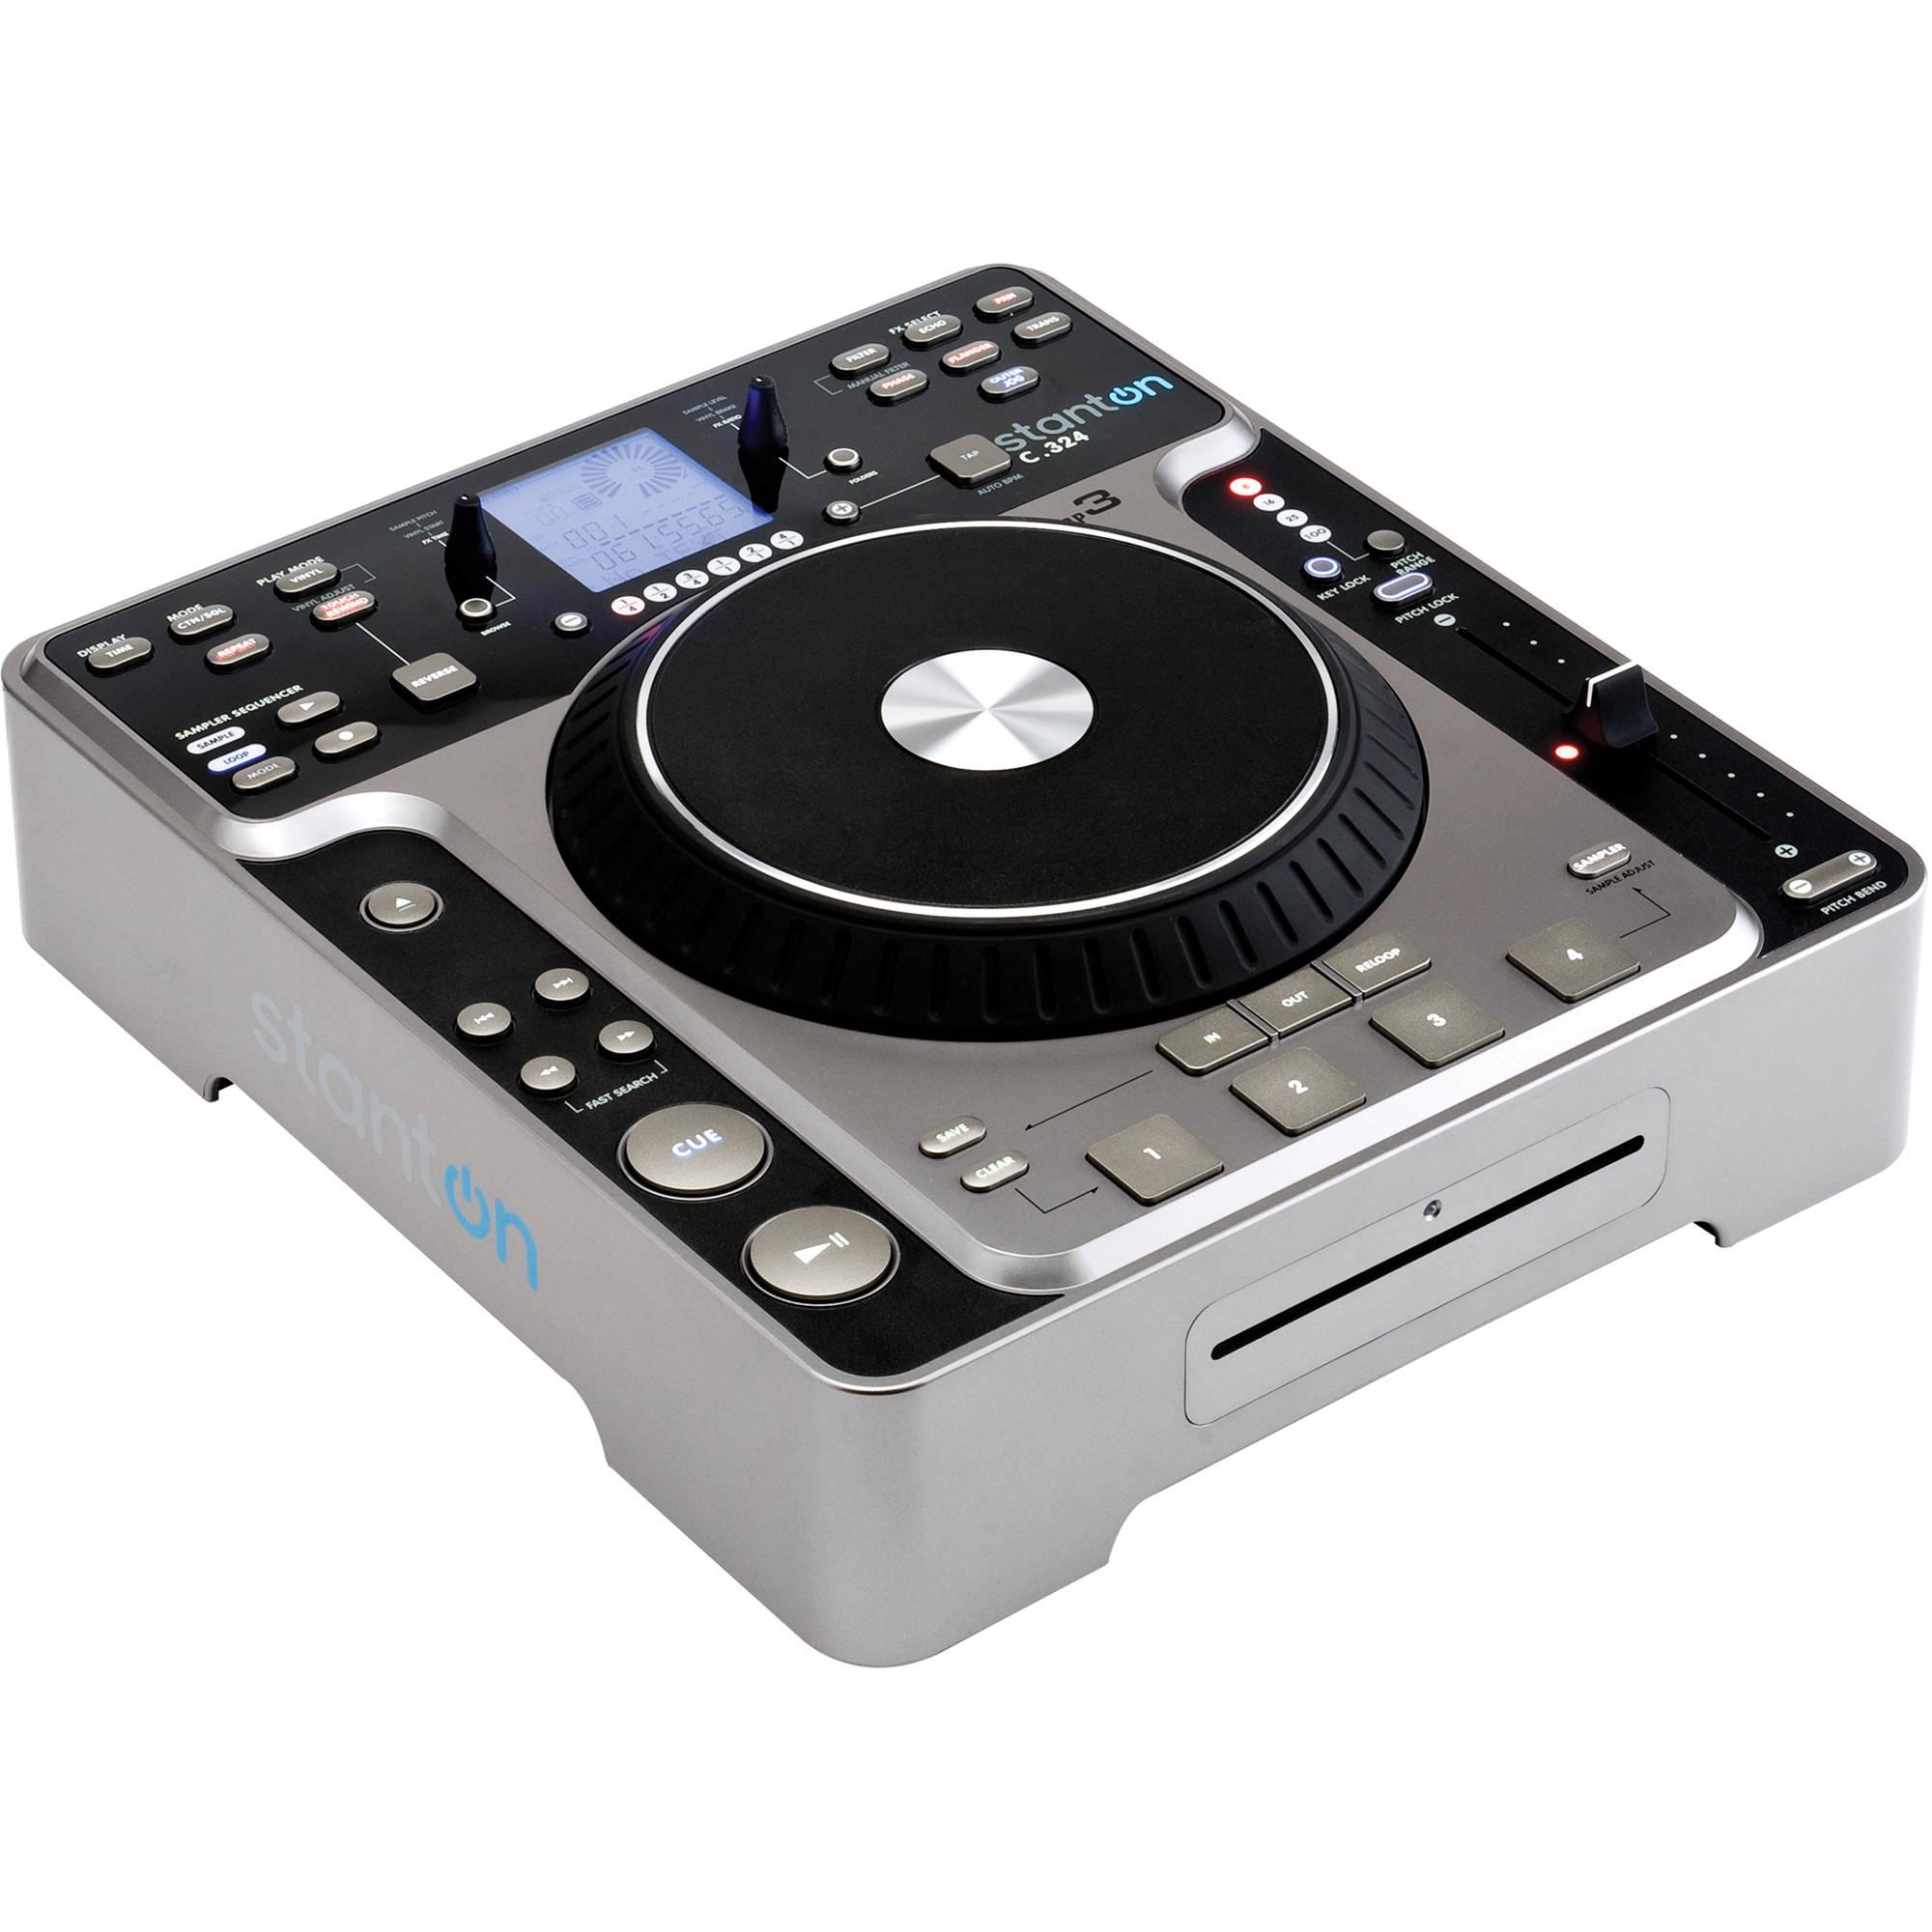 stanton professional dj table top cd player c324 b h photo. Black Bedroom Furniture Sets. Home Design Ideas